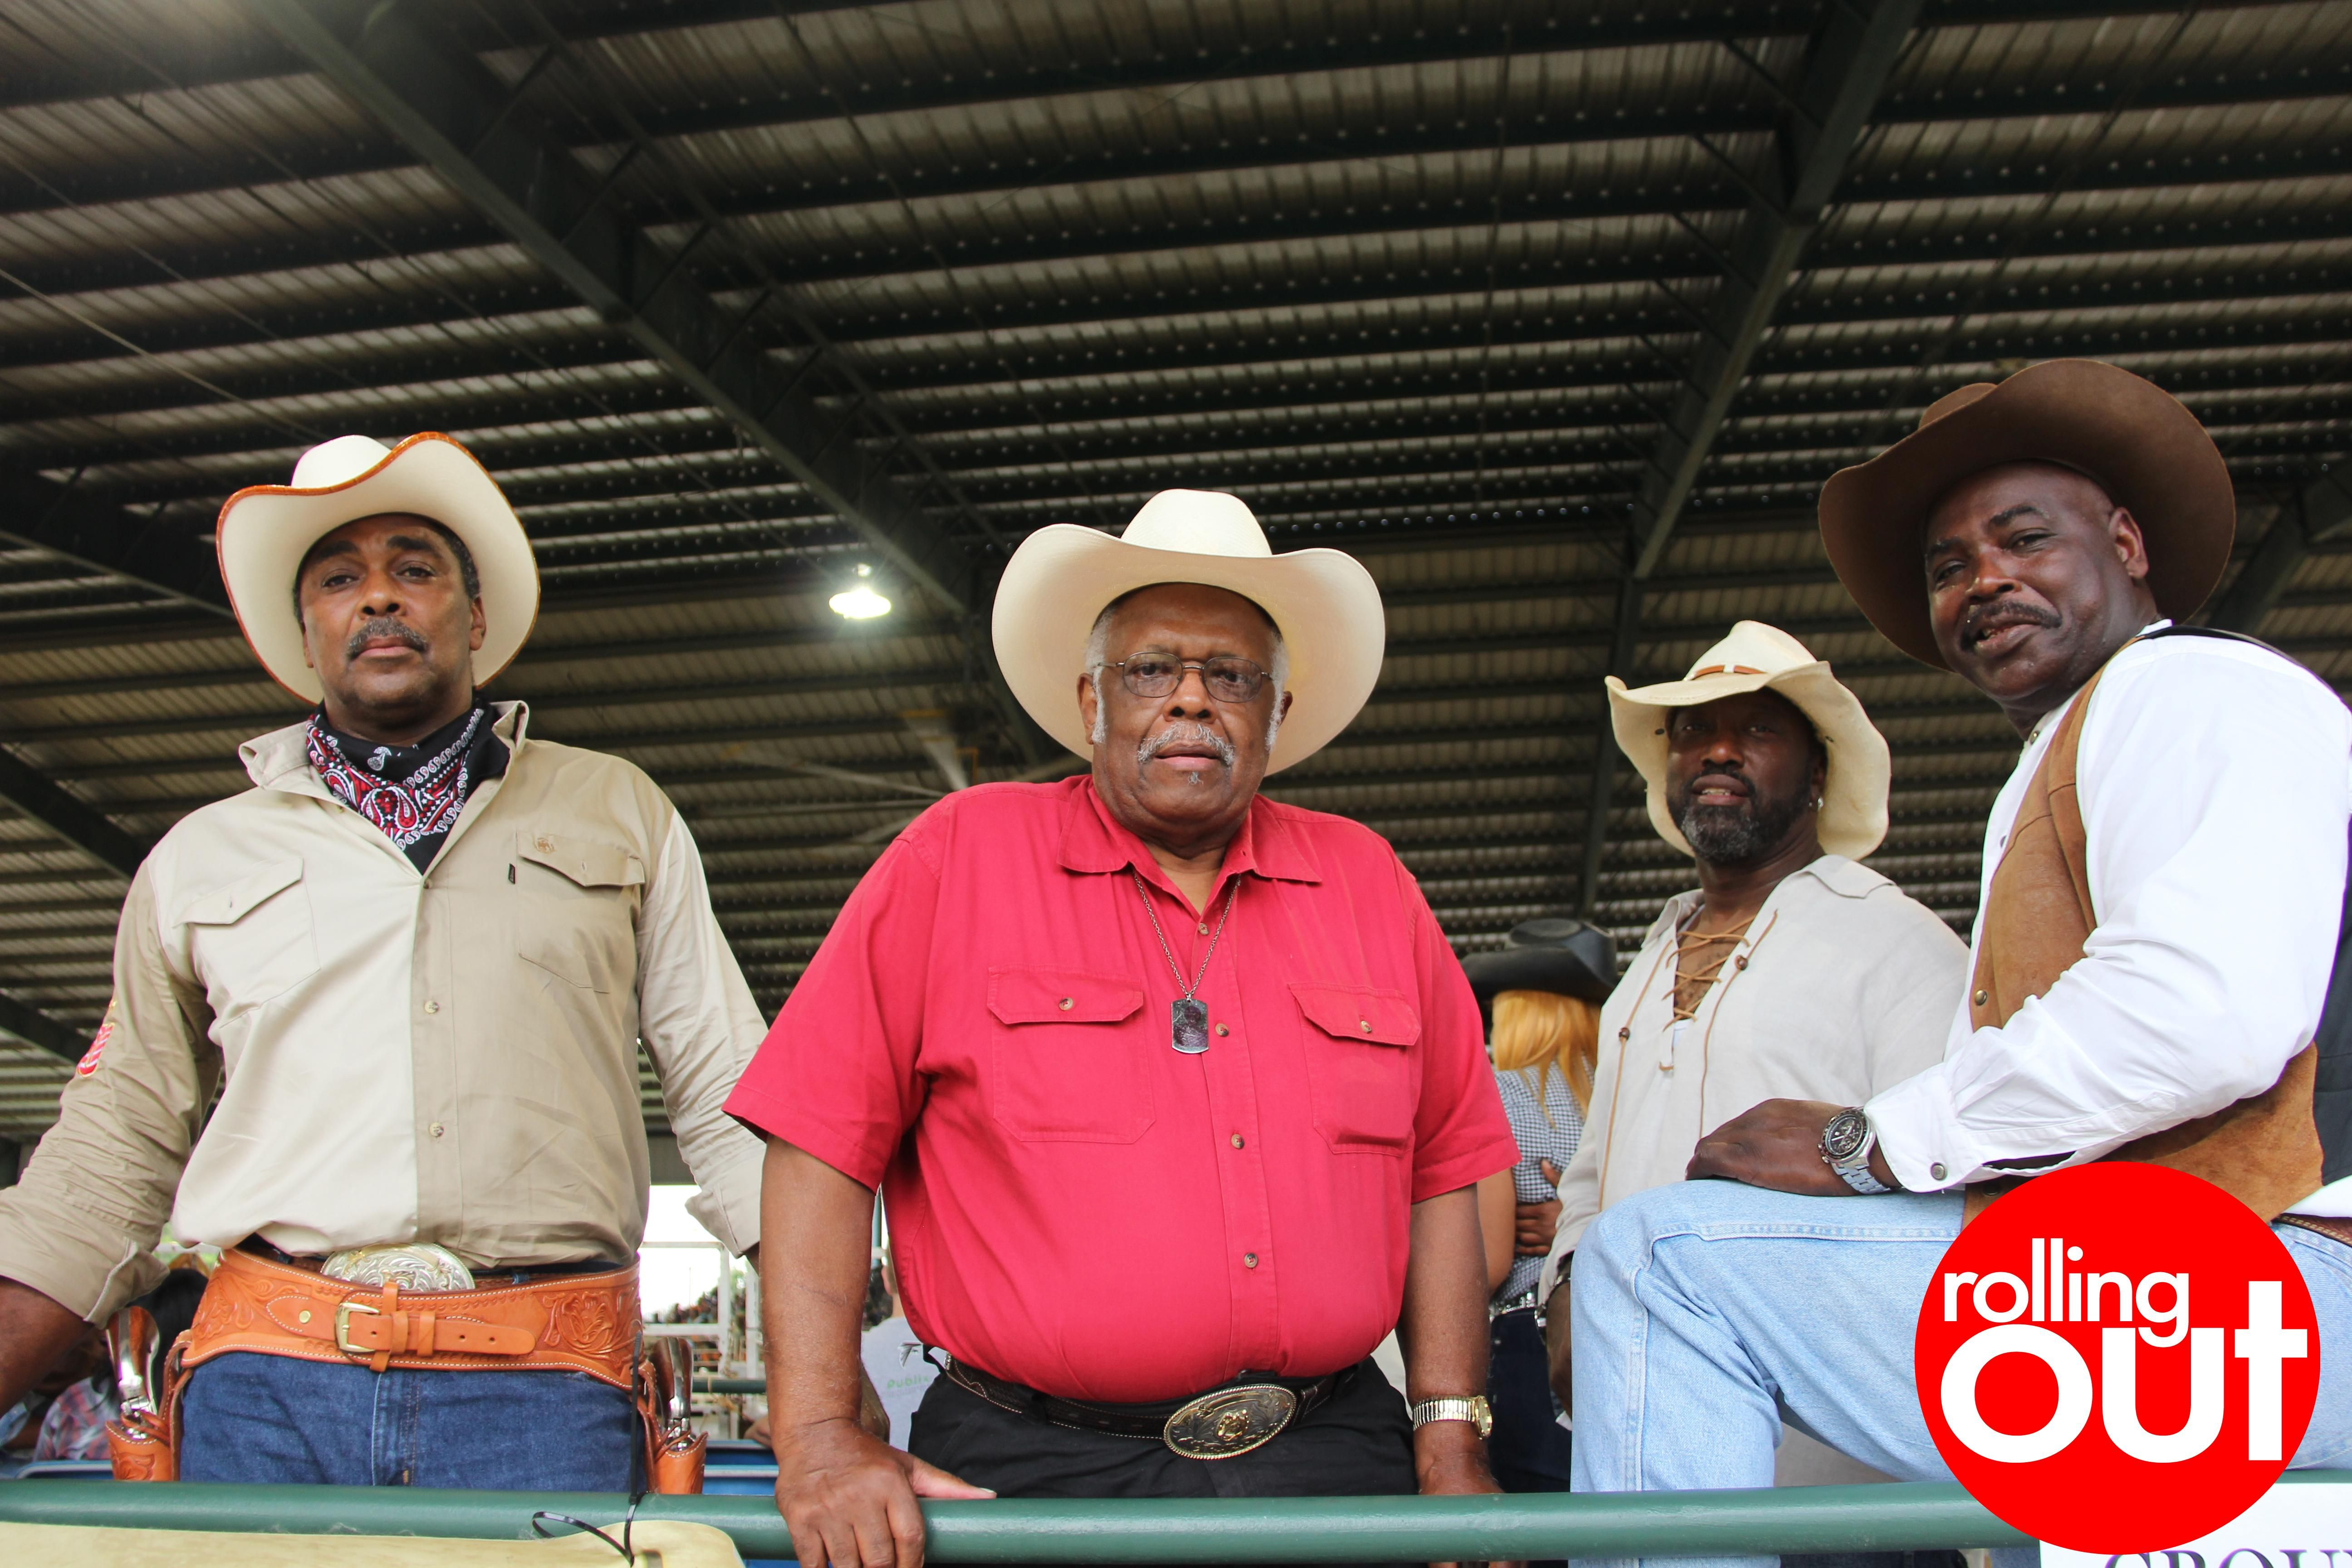 Black cowboys keeping black rodeo alive for the hip-hop generation